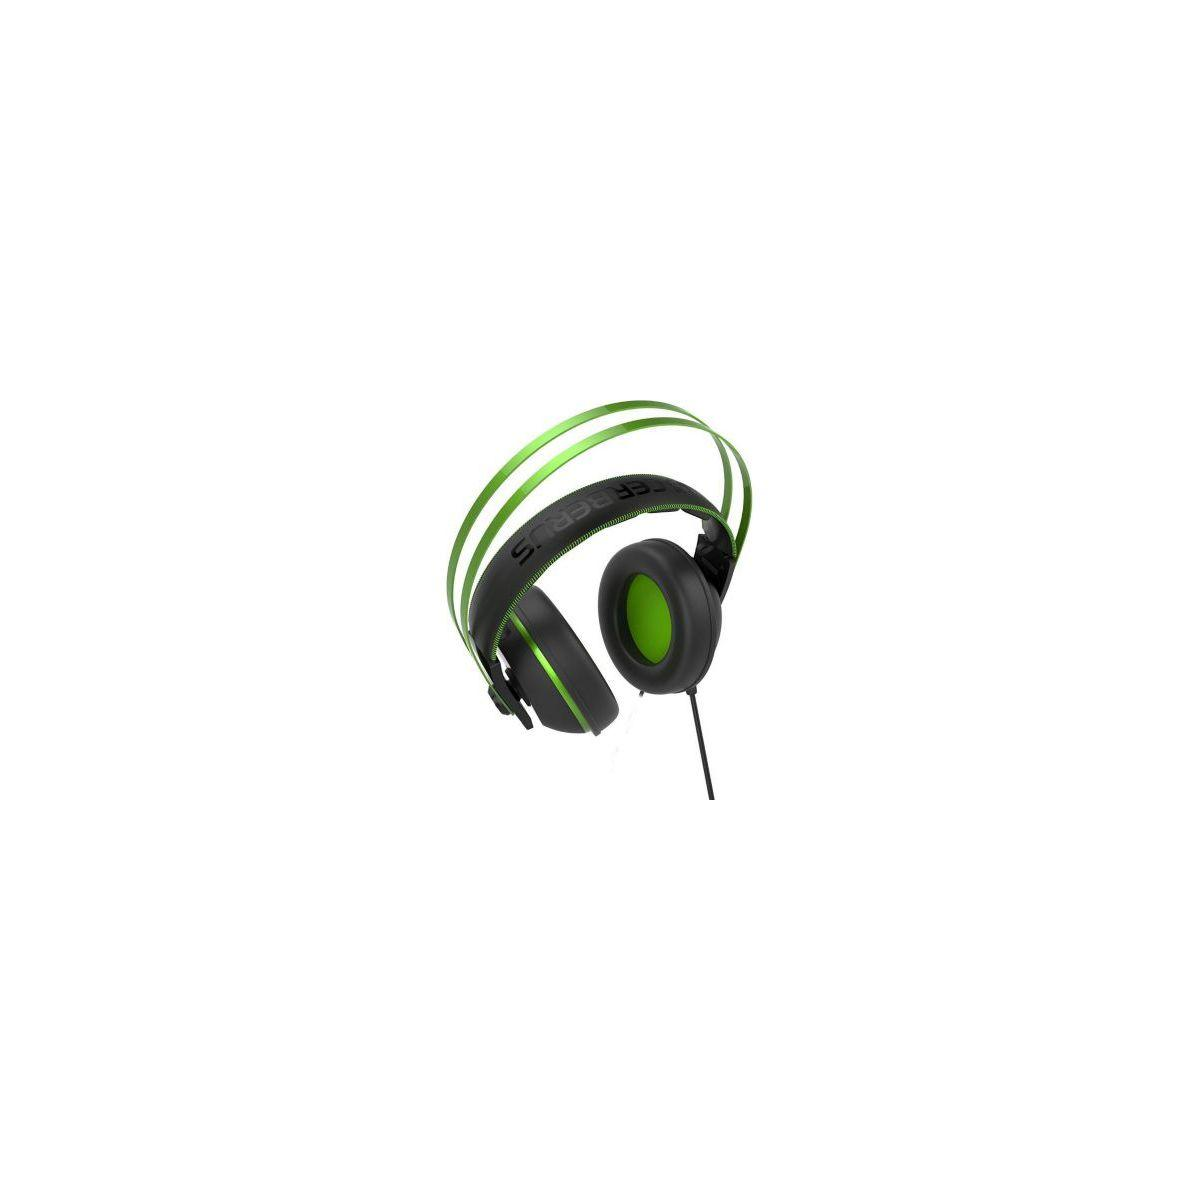 Casque gamer asus cerberus v2 vert - 2% de remise imm�diate avec le code : deal2